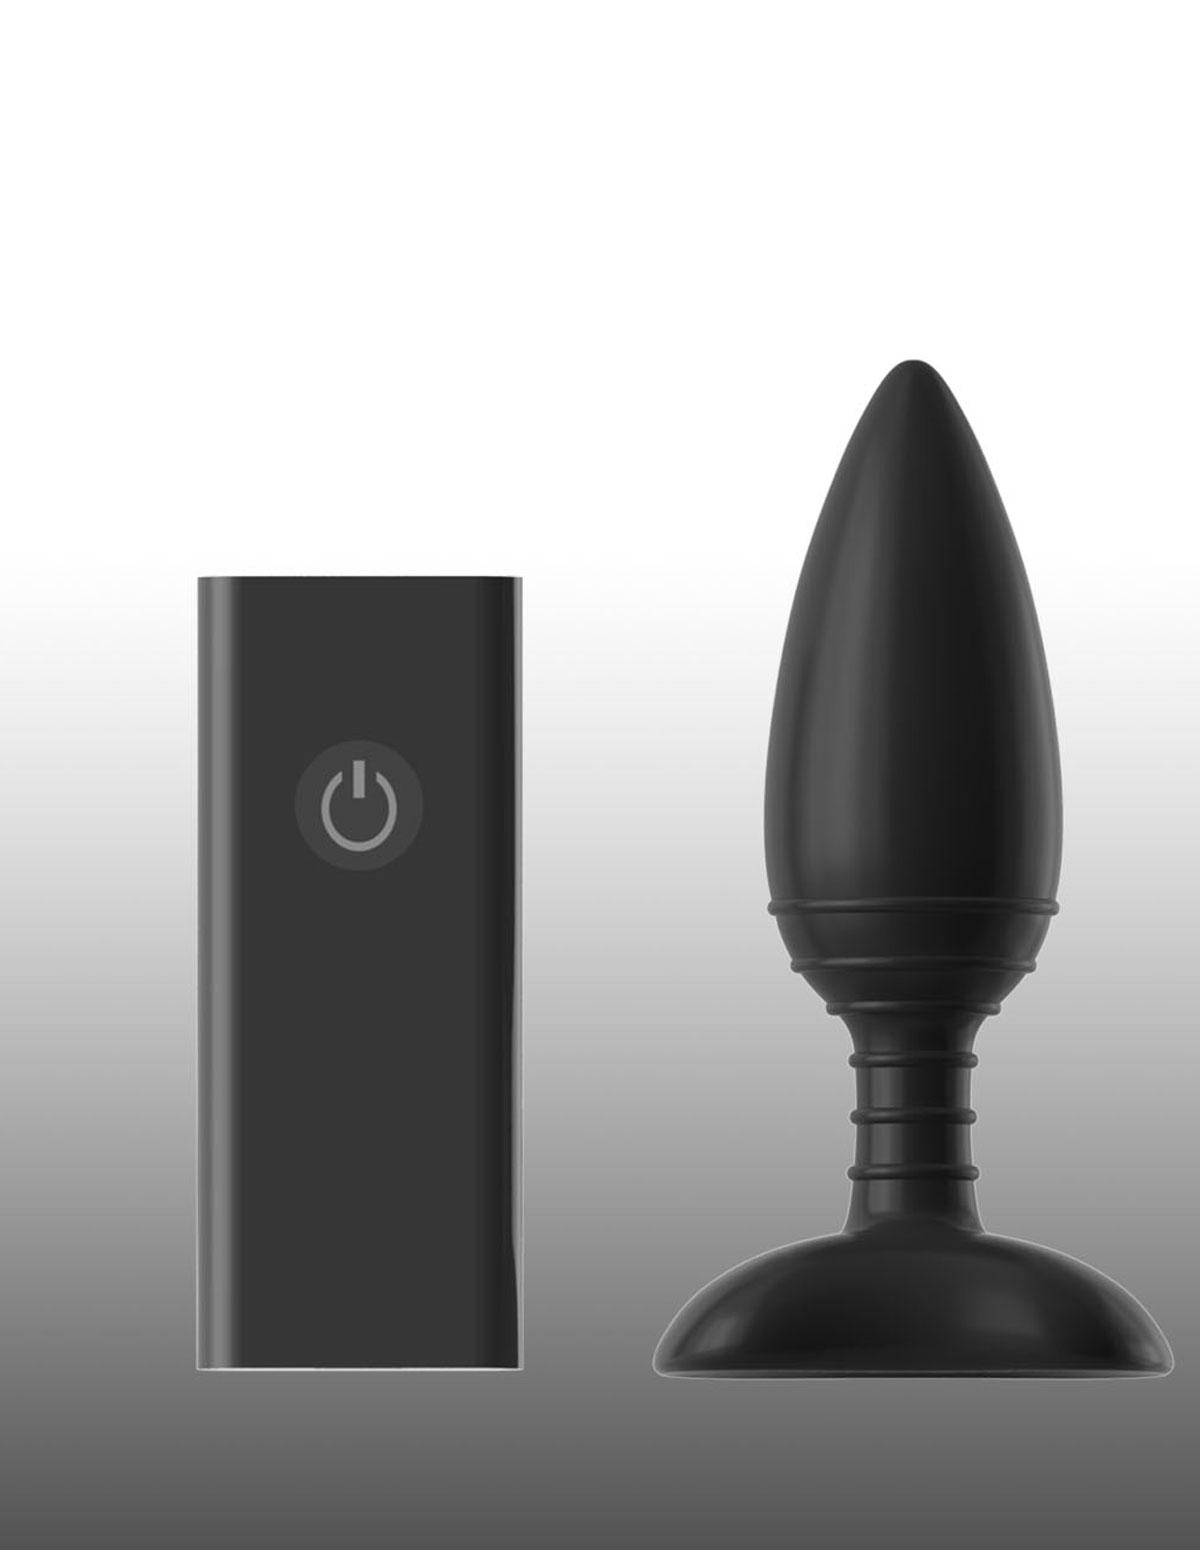 Nexus Ace Remote Control Butt Plug Small